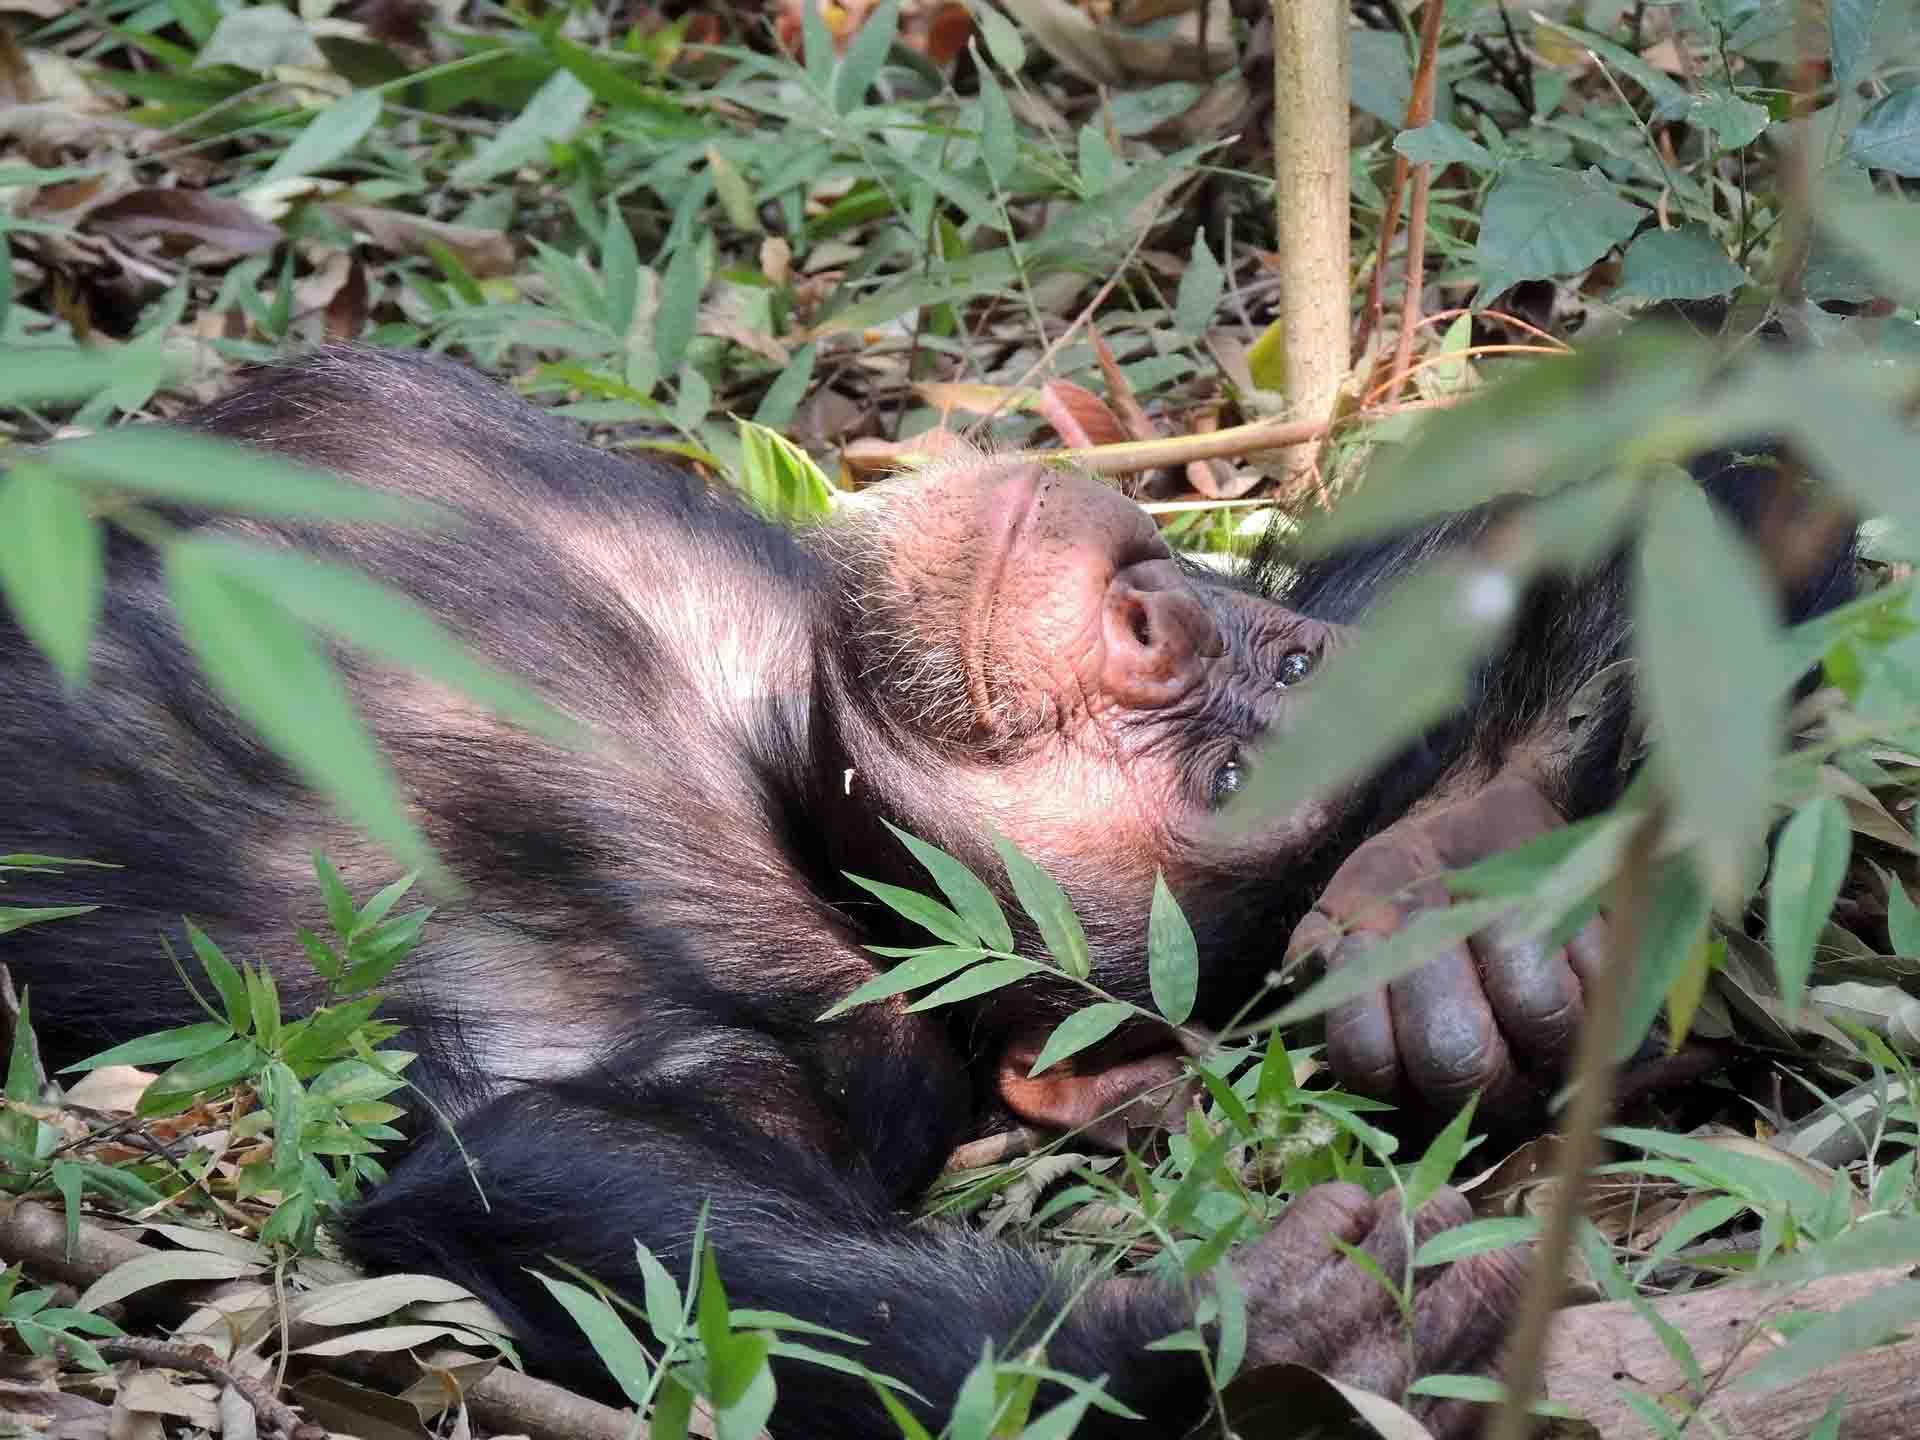 chimpanzee-718273_1920